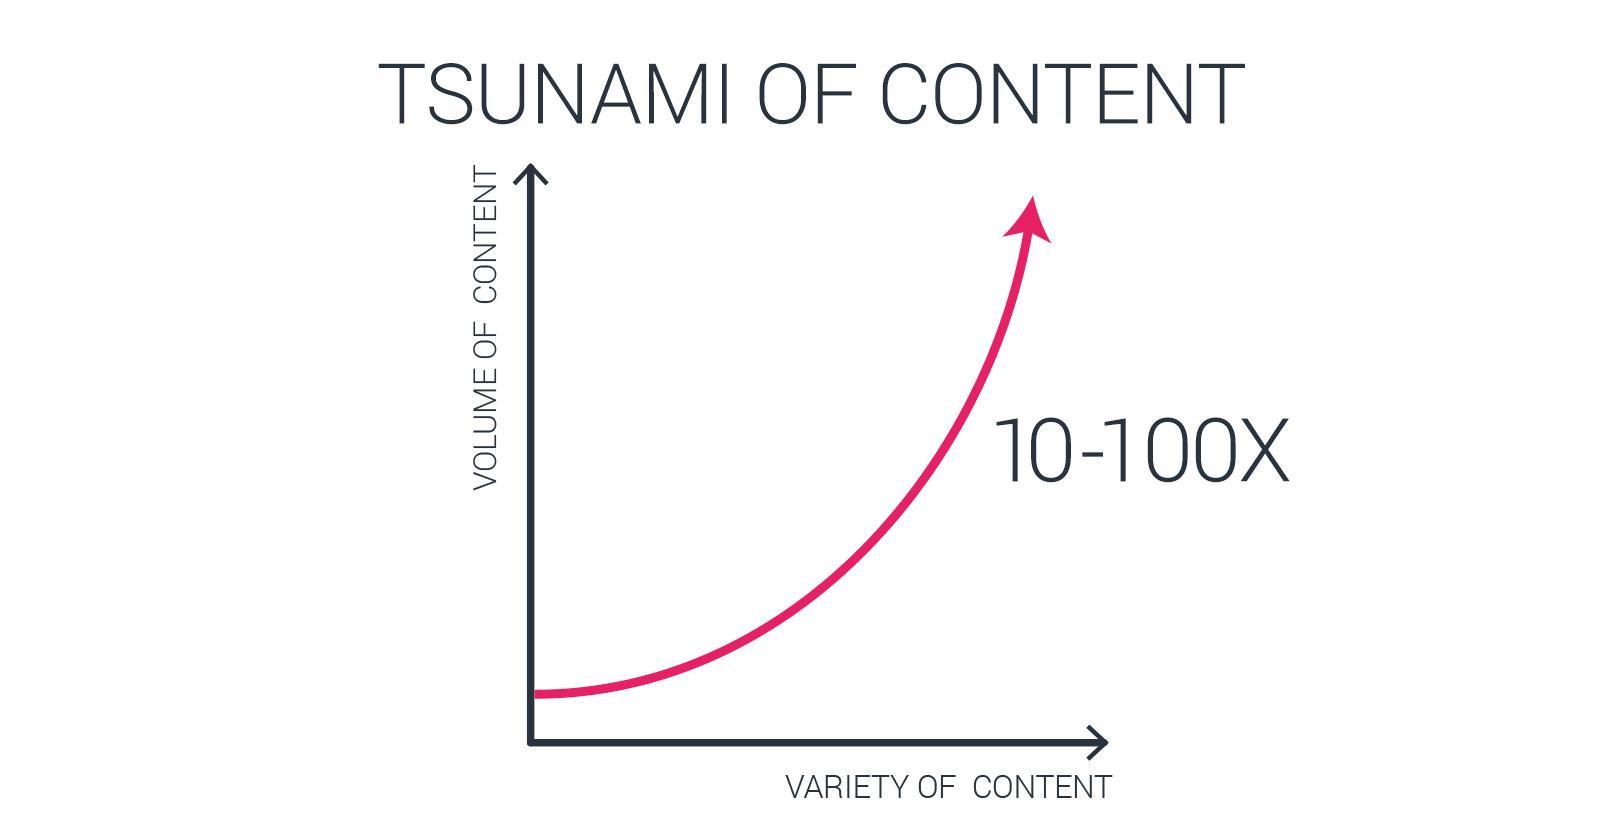 TsunamiContentOK